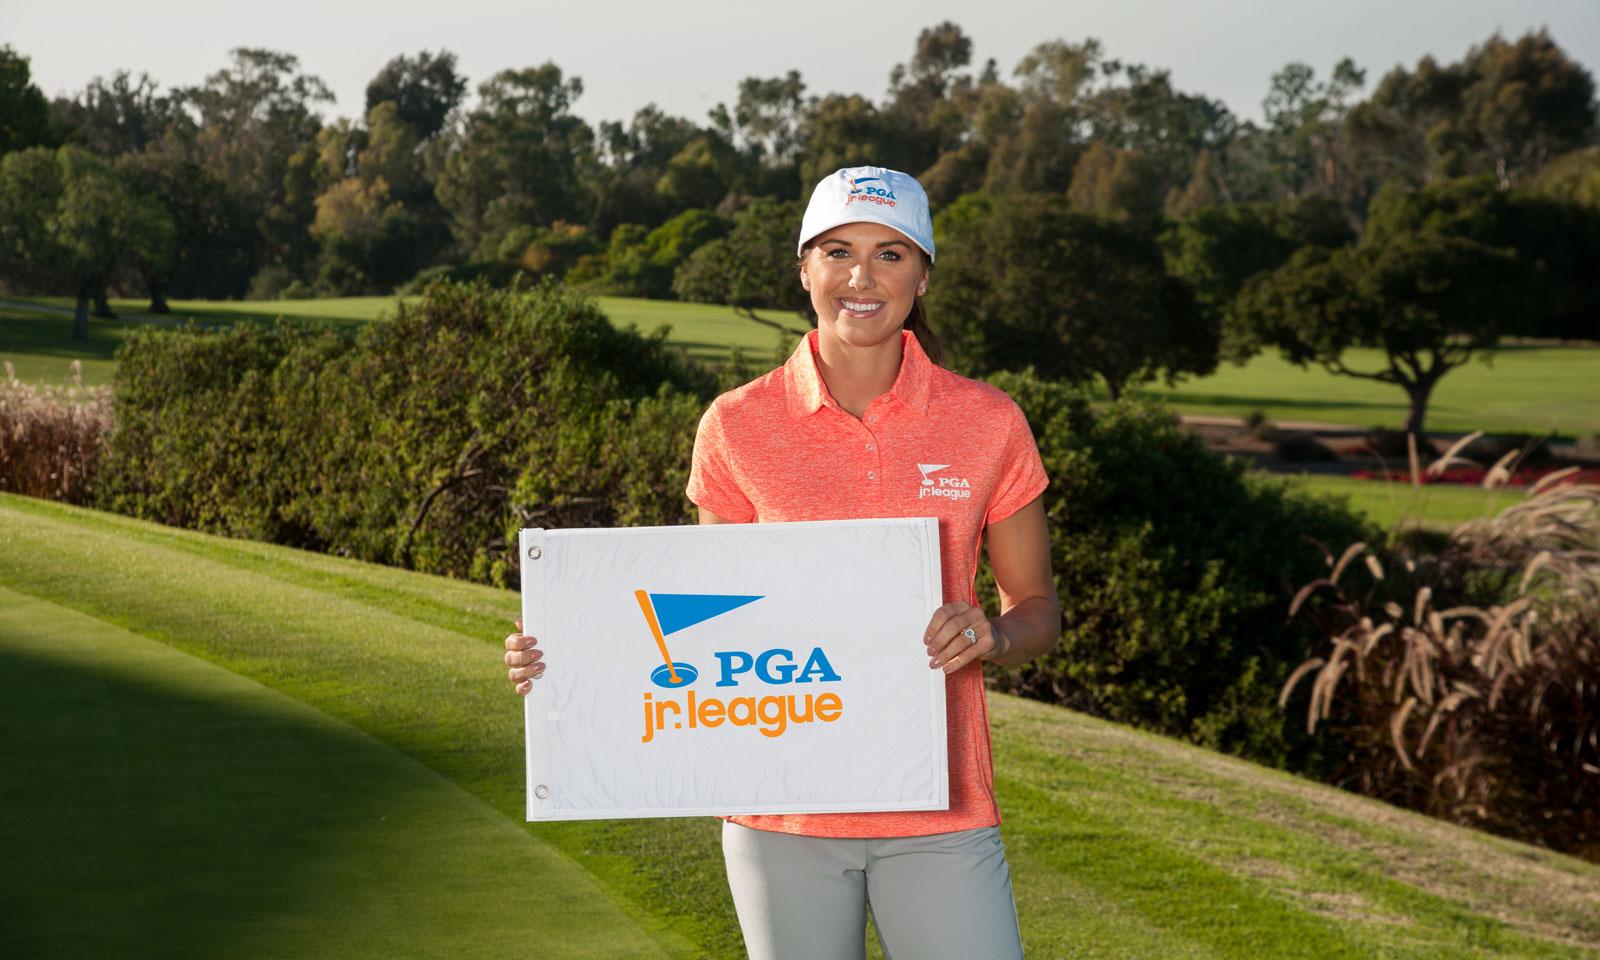 PGA-Jr.-League